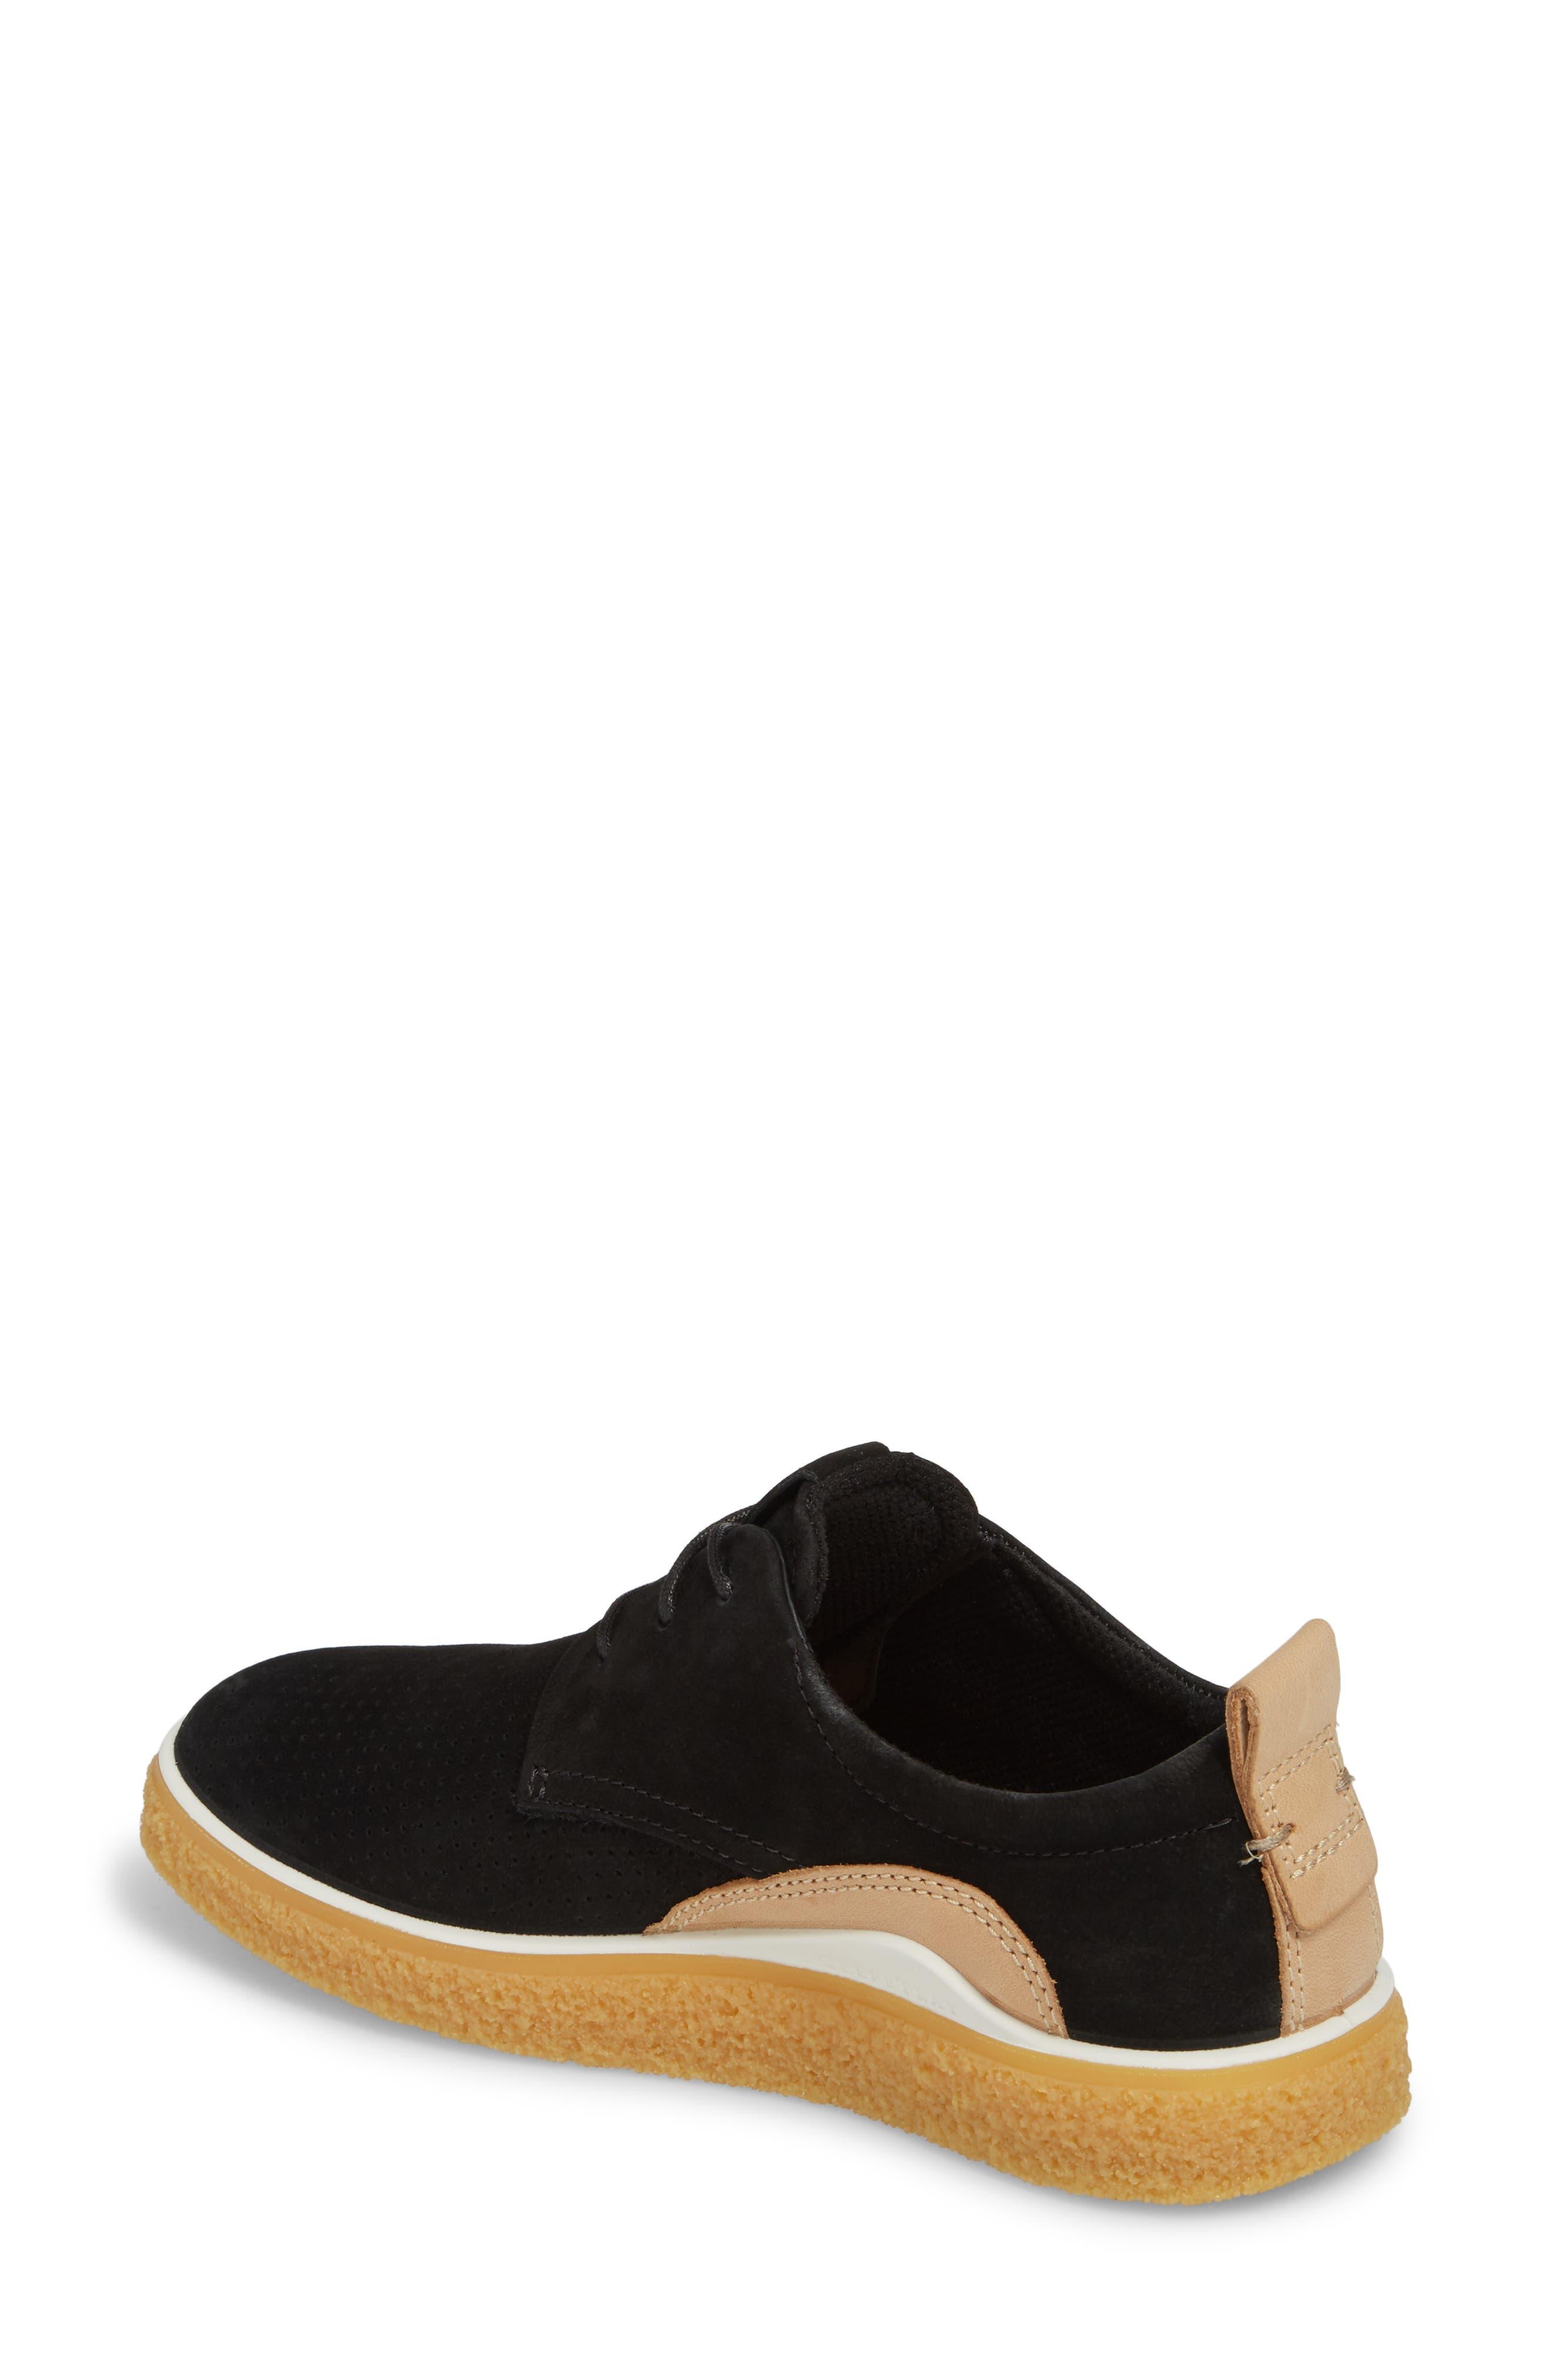 Crepetray Sneaker,                             Alternate thumbnail 2, color,                             009